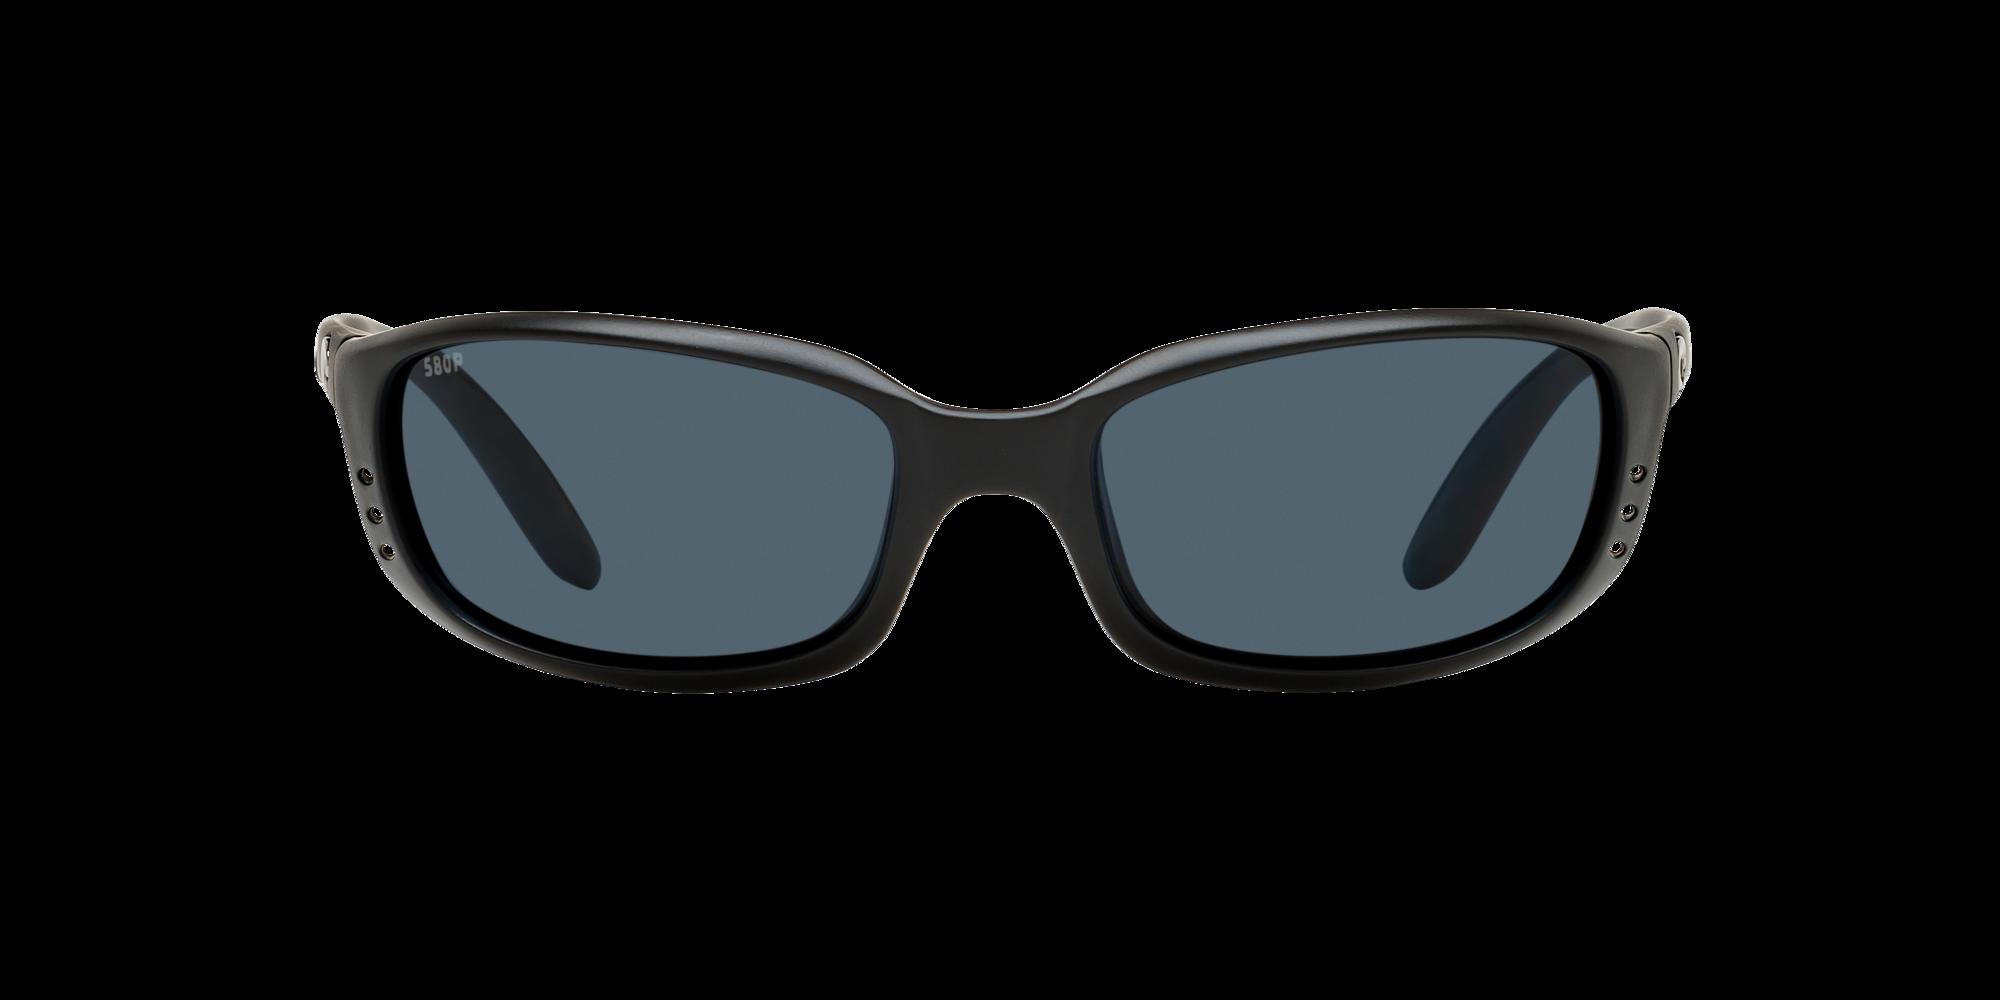 Image for BRINE from LensCrafters | Glasses, Prescription Glasses Online, Eyewear